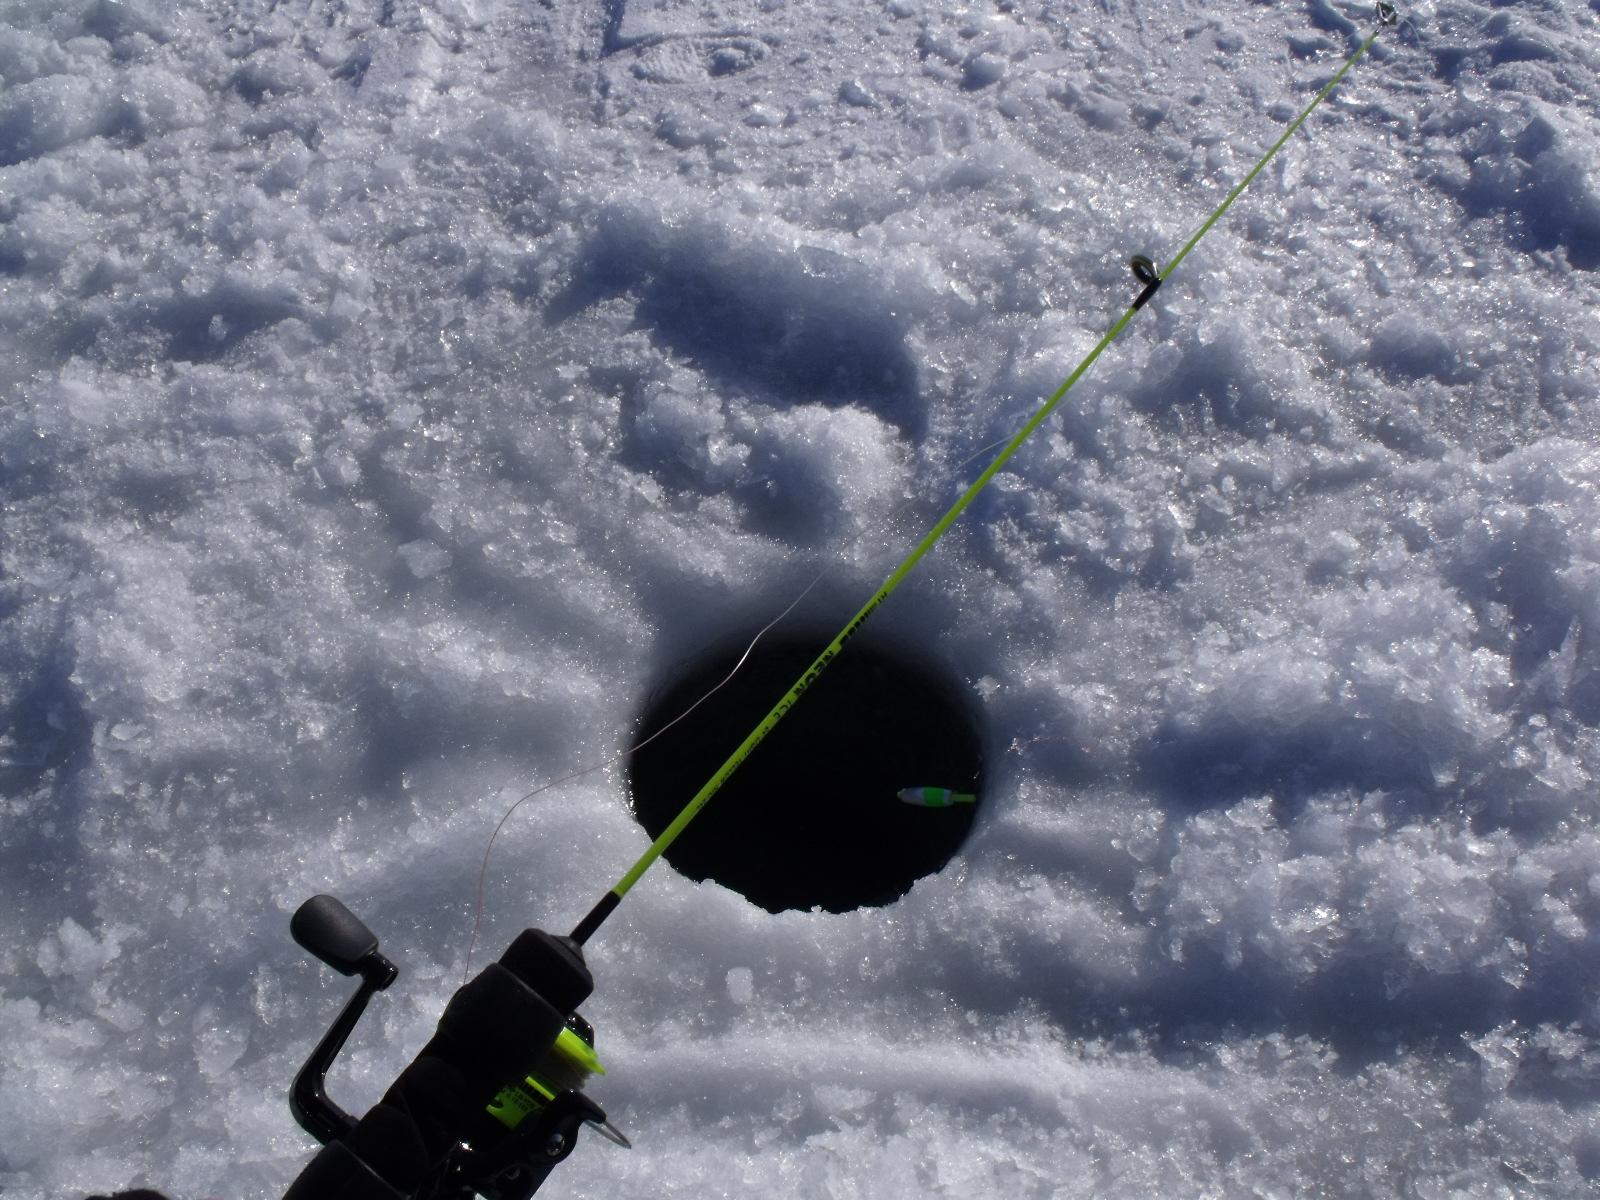 Ice fishing a minnesota tradition callens honey farm for Ice fishing setup